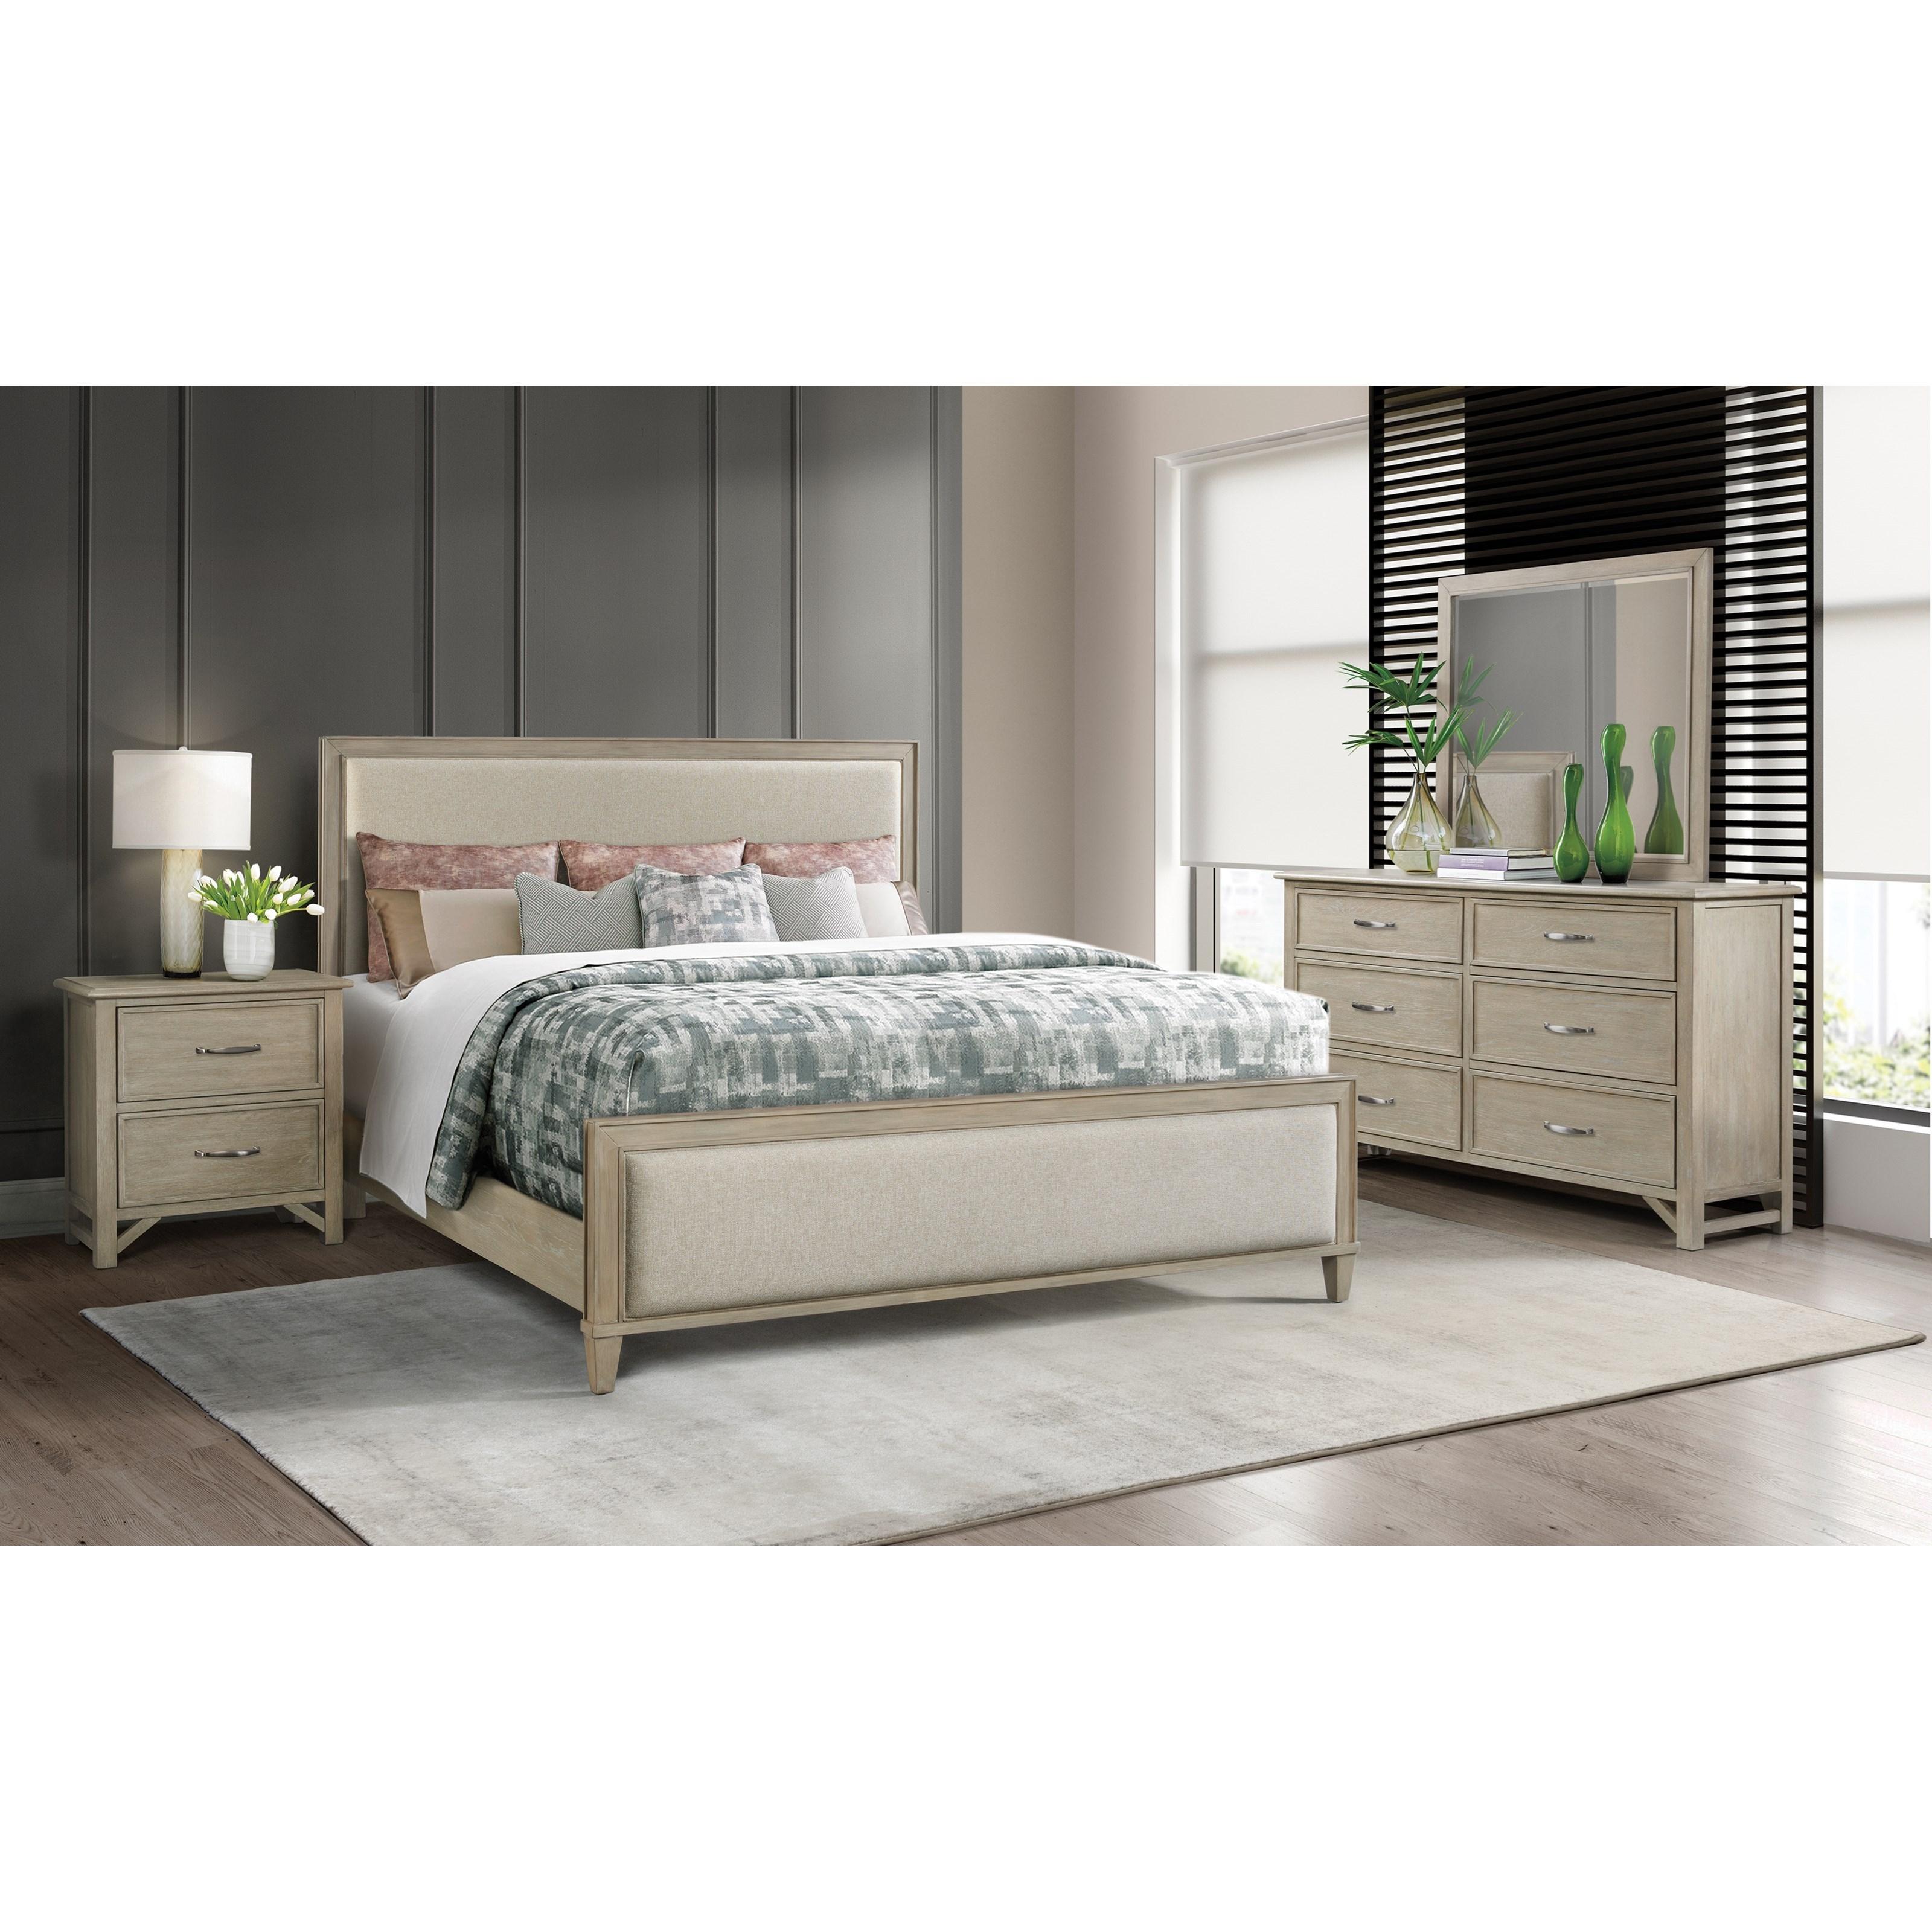 Talford Natural King Bedroom Group  by Riverside Furniture at Mueller Furniture